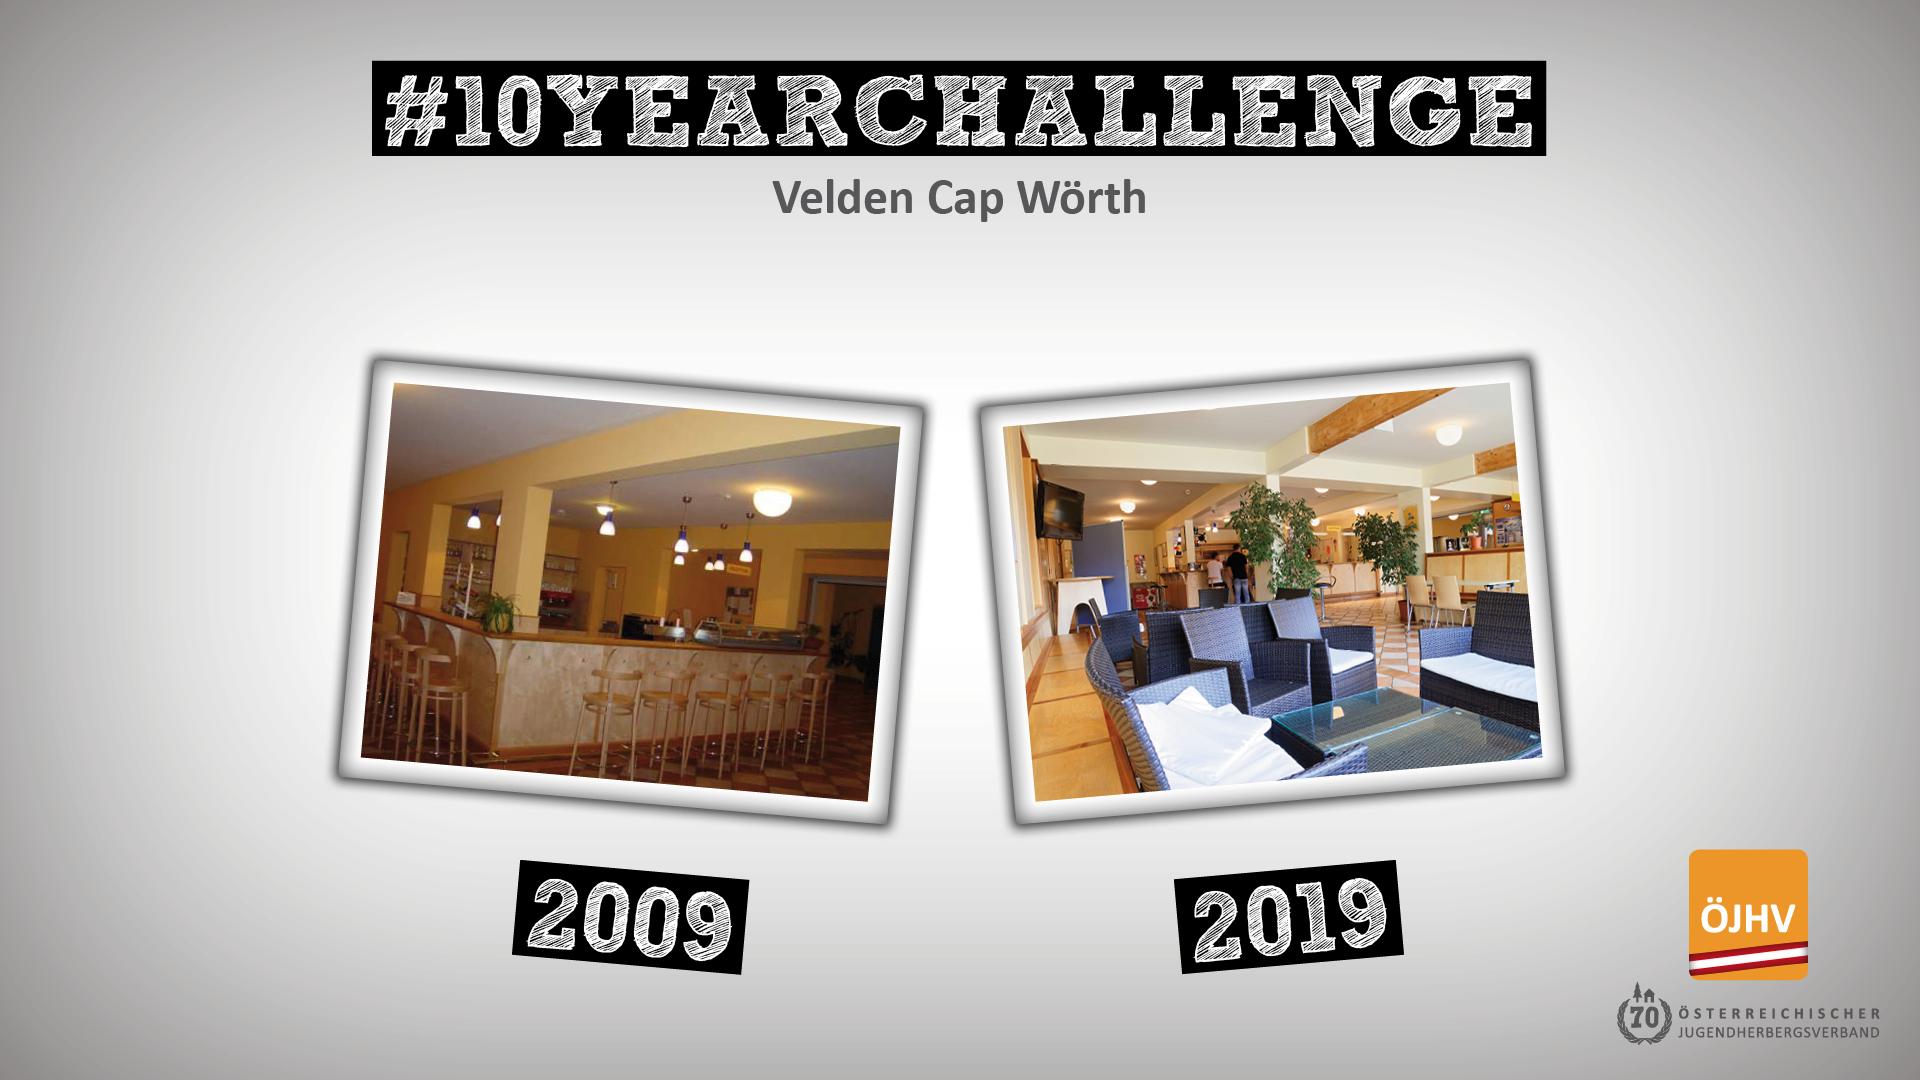 Jugendherbergsverband #10YearChallenge Velden Cap Wörth